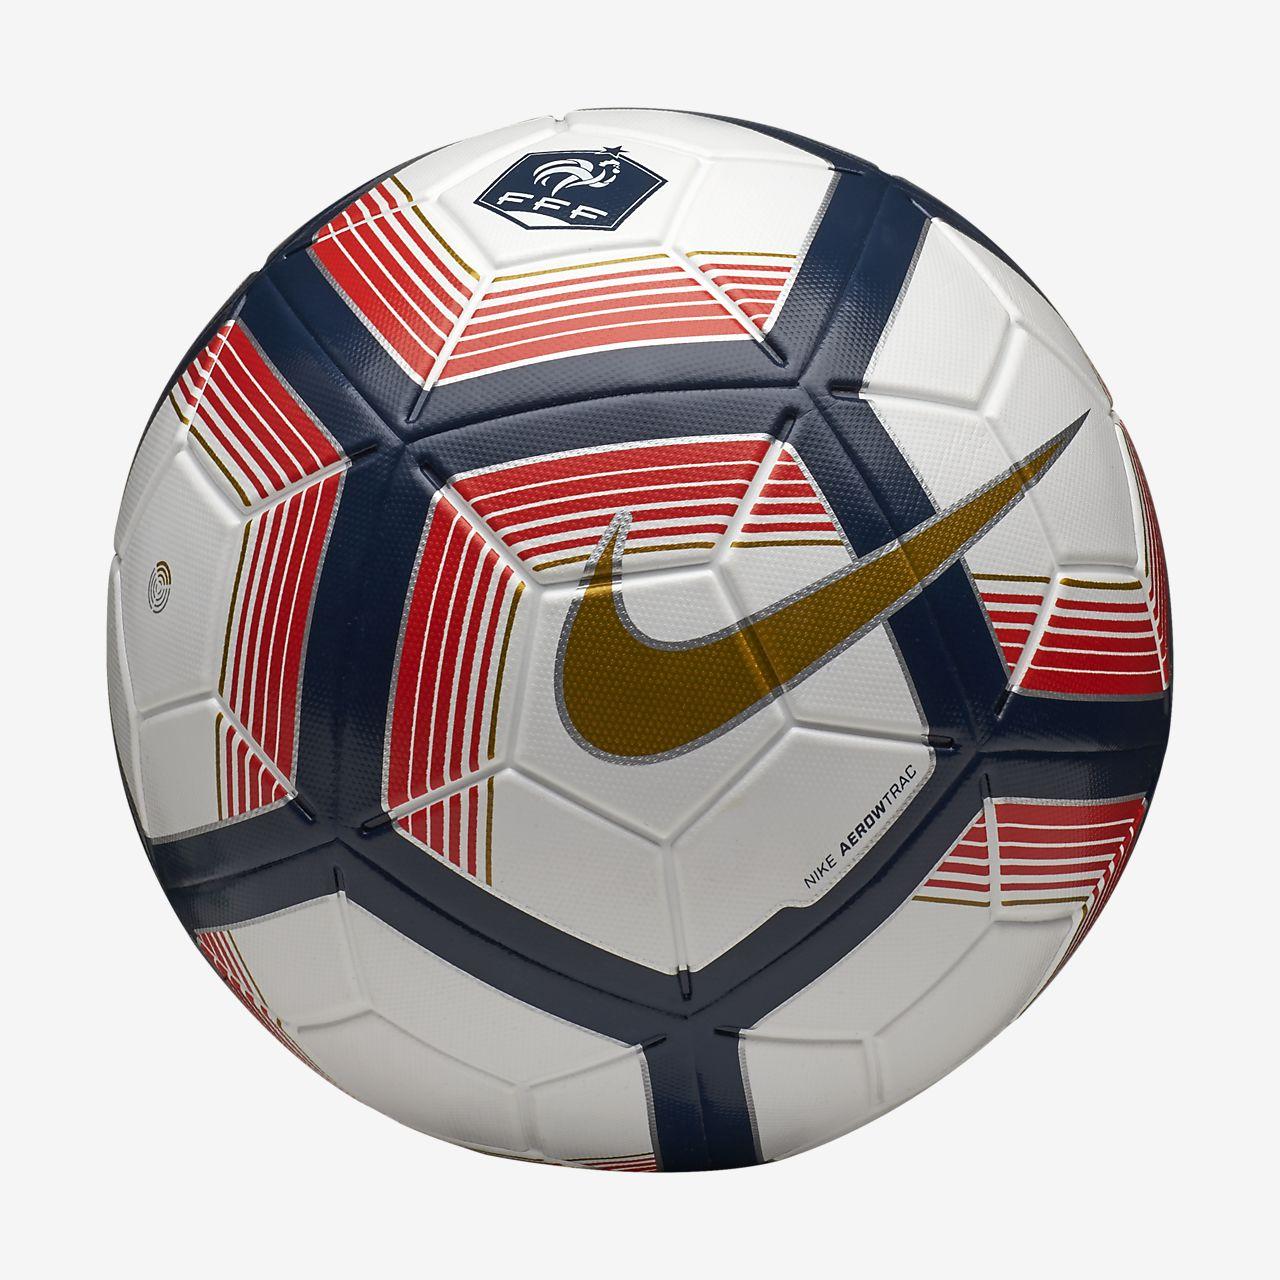 Ballon de football FFF Magia Team FIFA. Nike.com BE b42a0973184